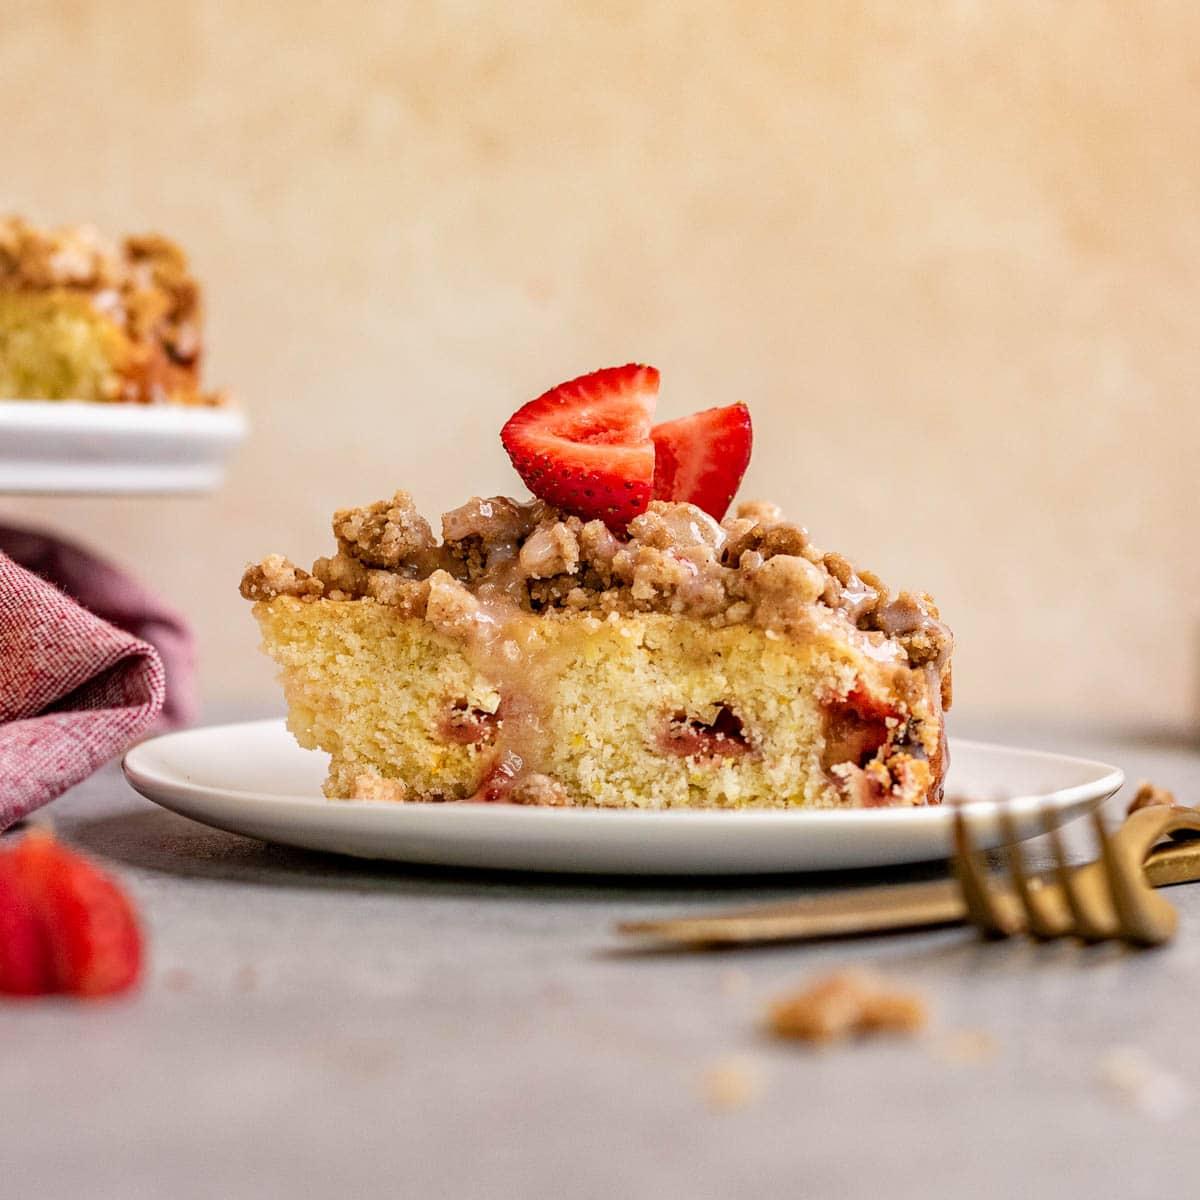 Strawberry Coffee Cake slice on plate